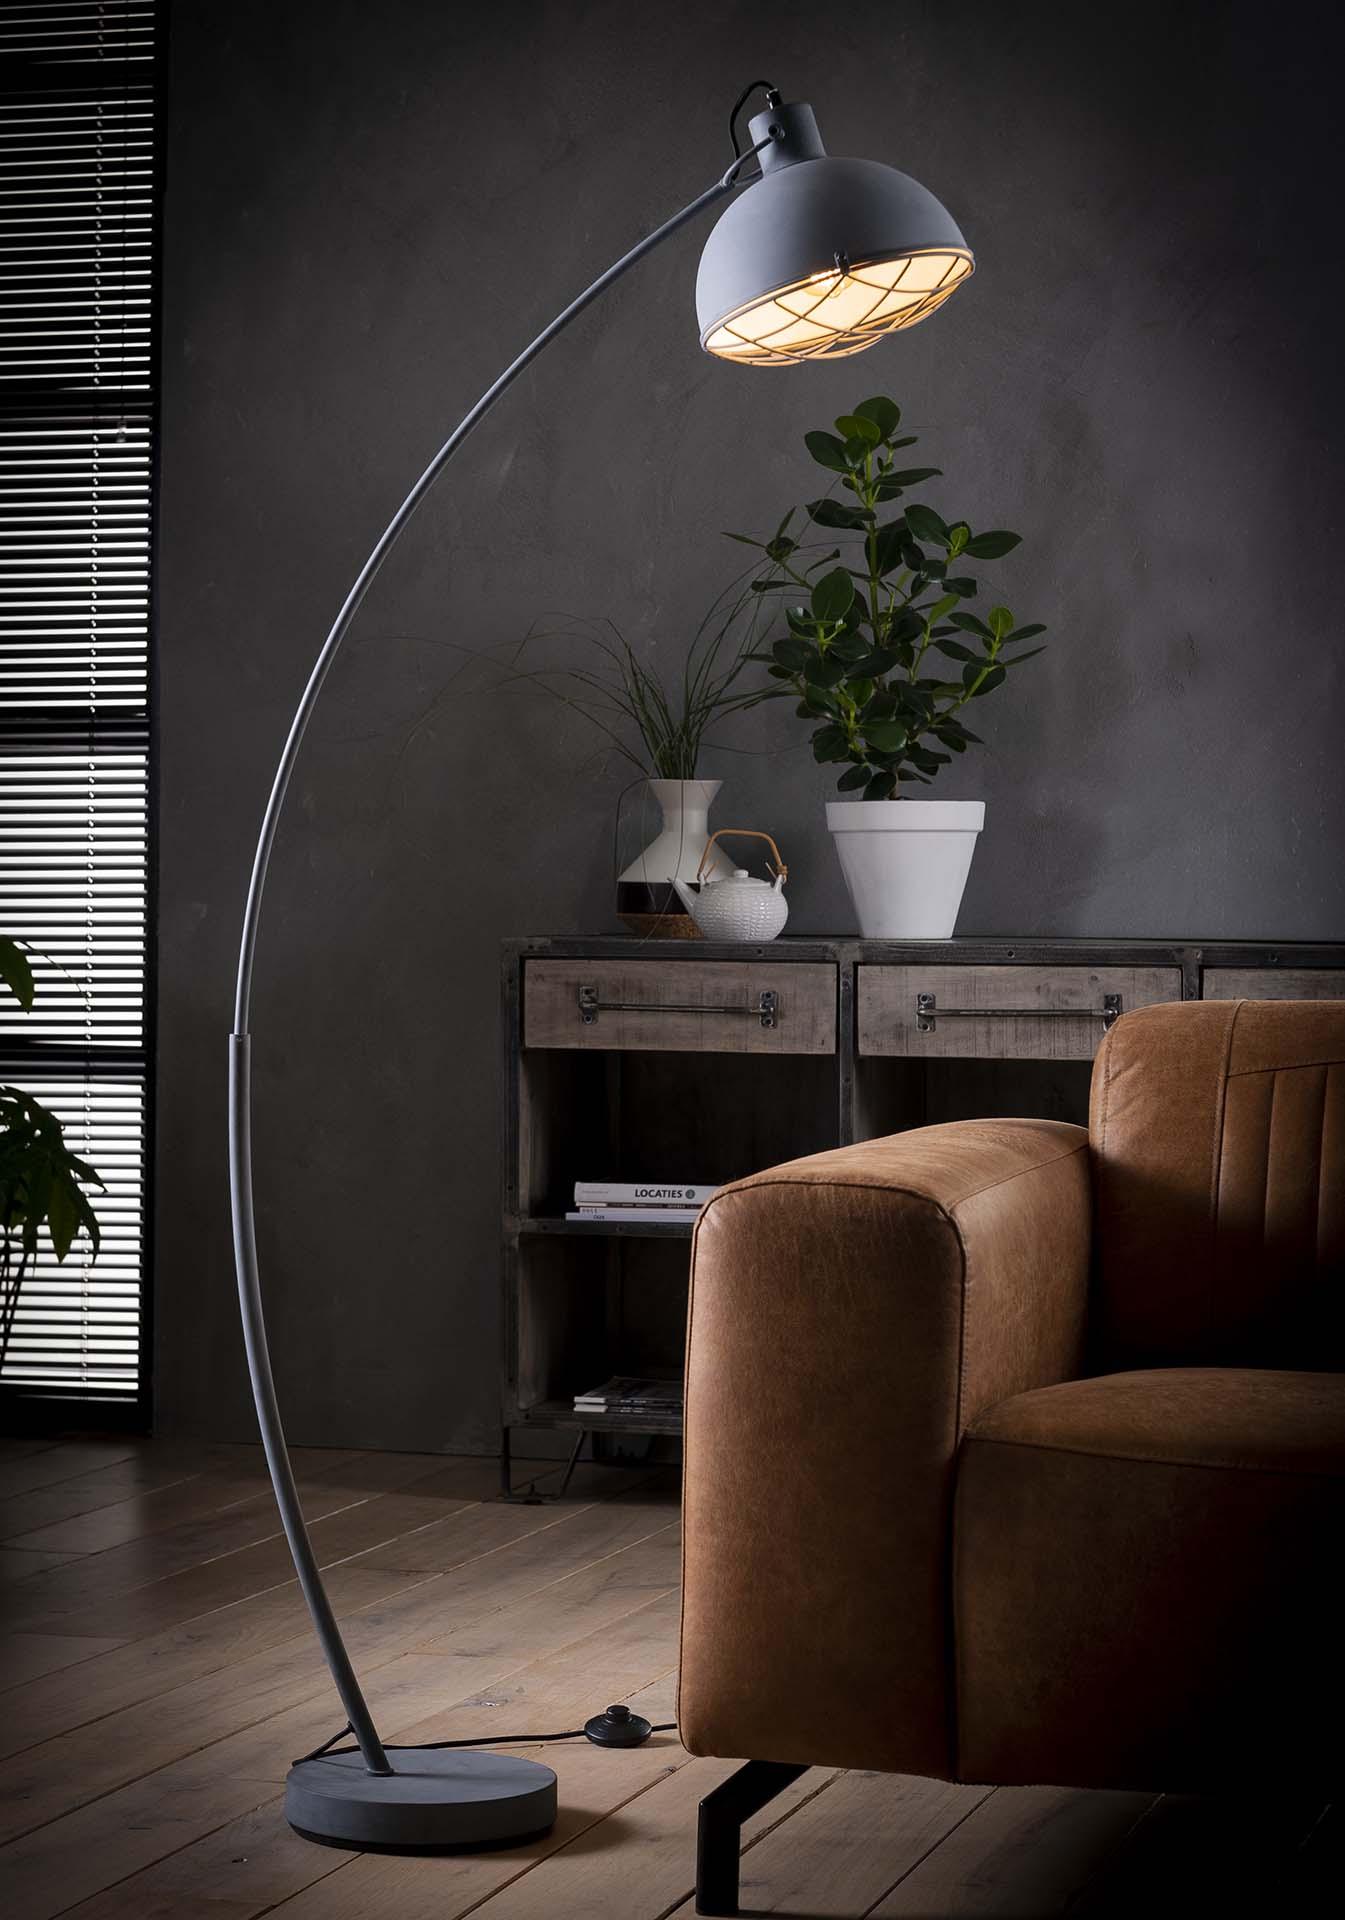 Verlichting | Vloerlampen kopen van LifestyleFurn